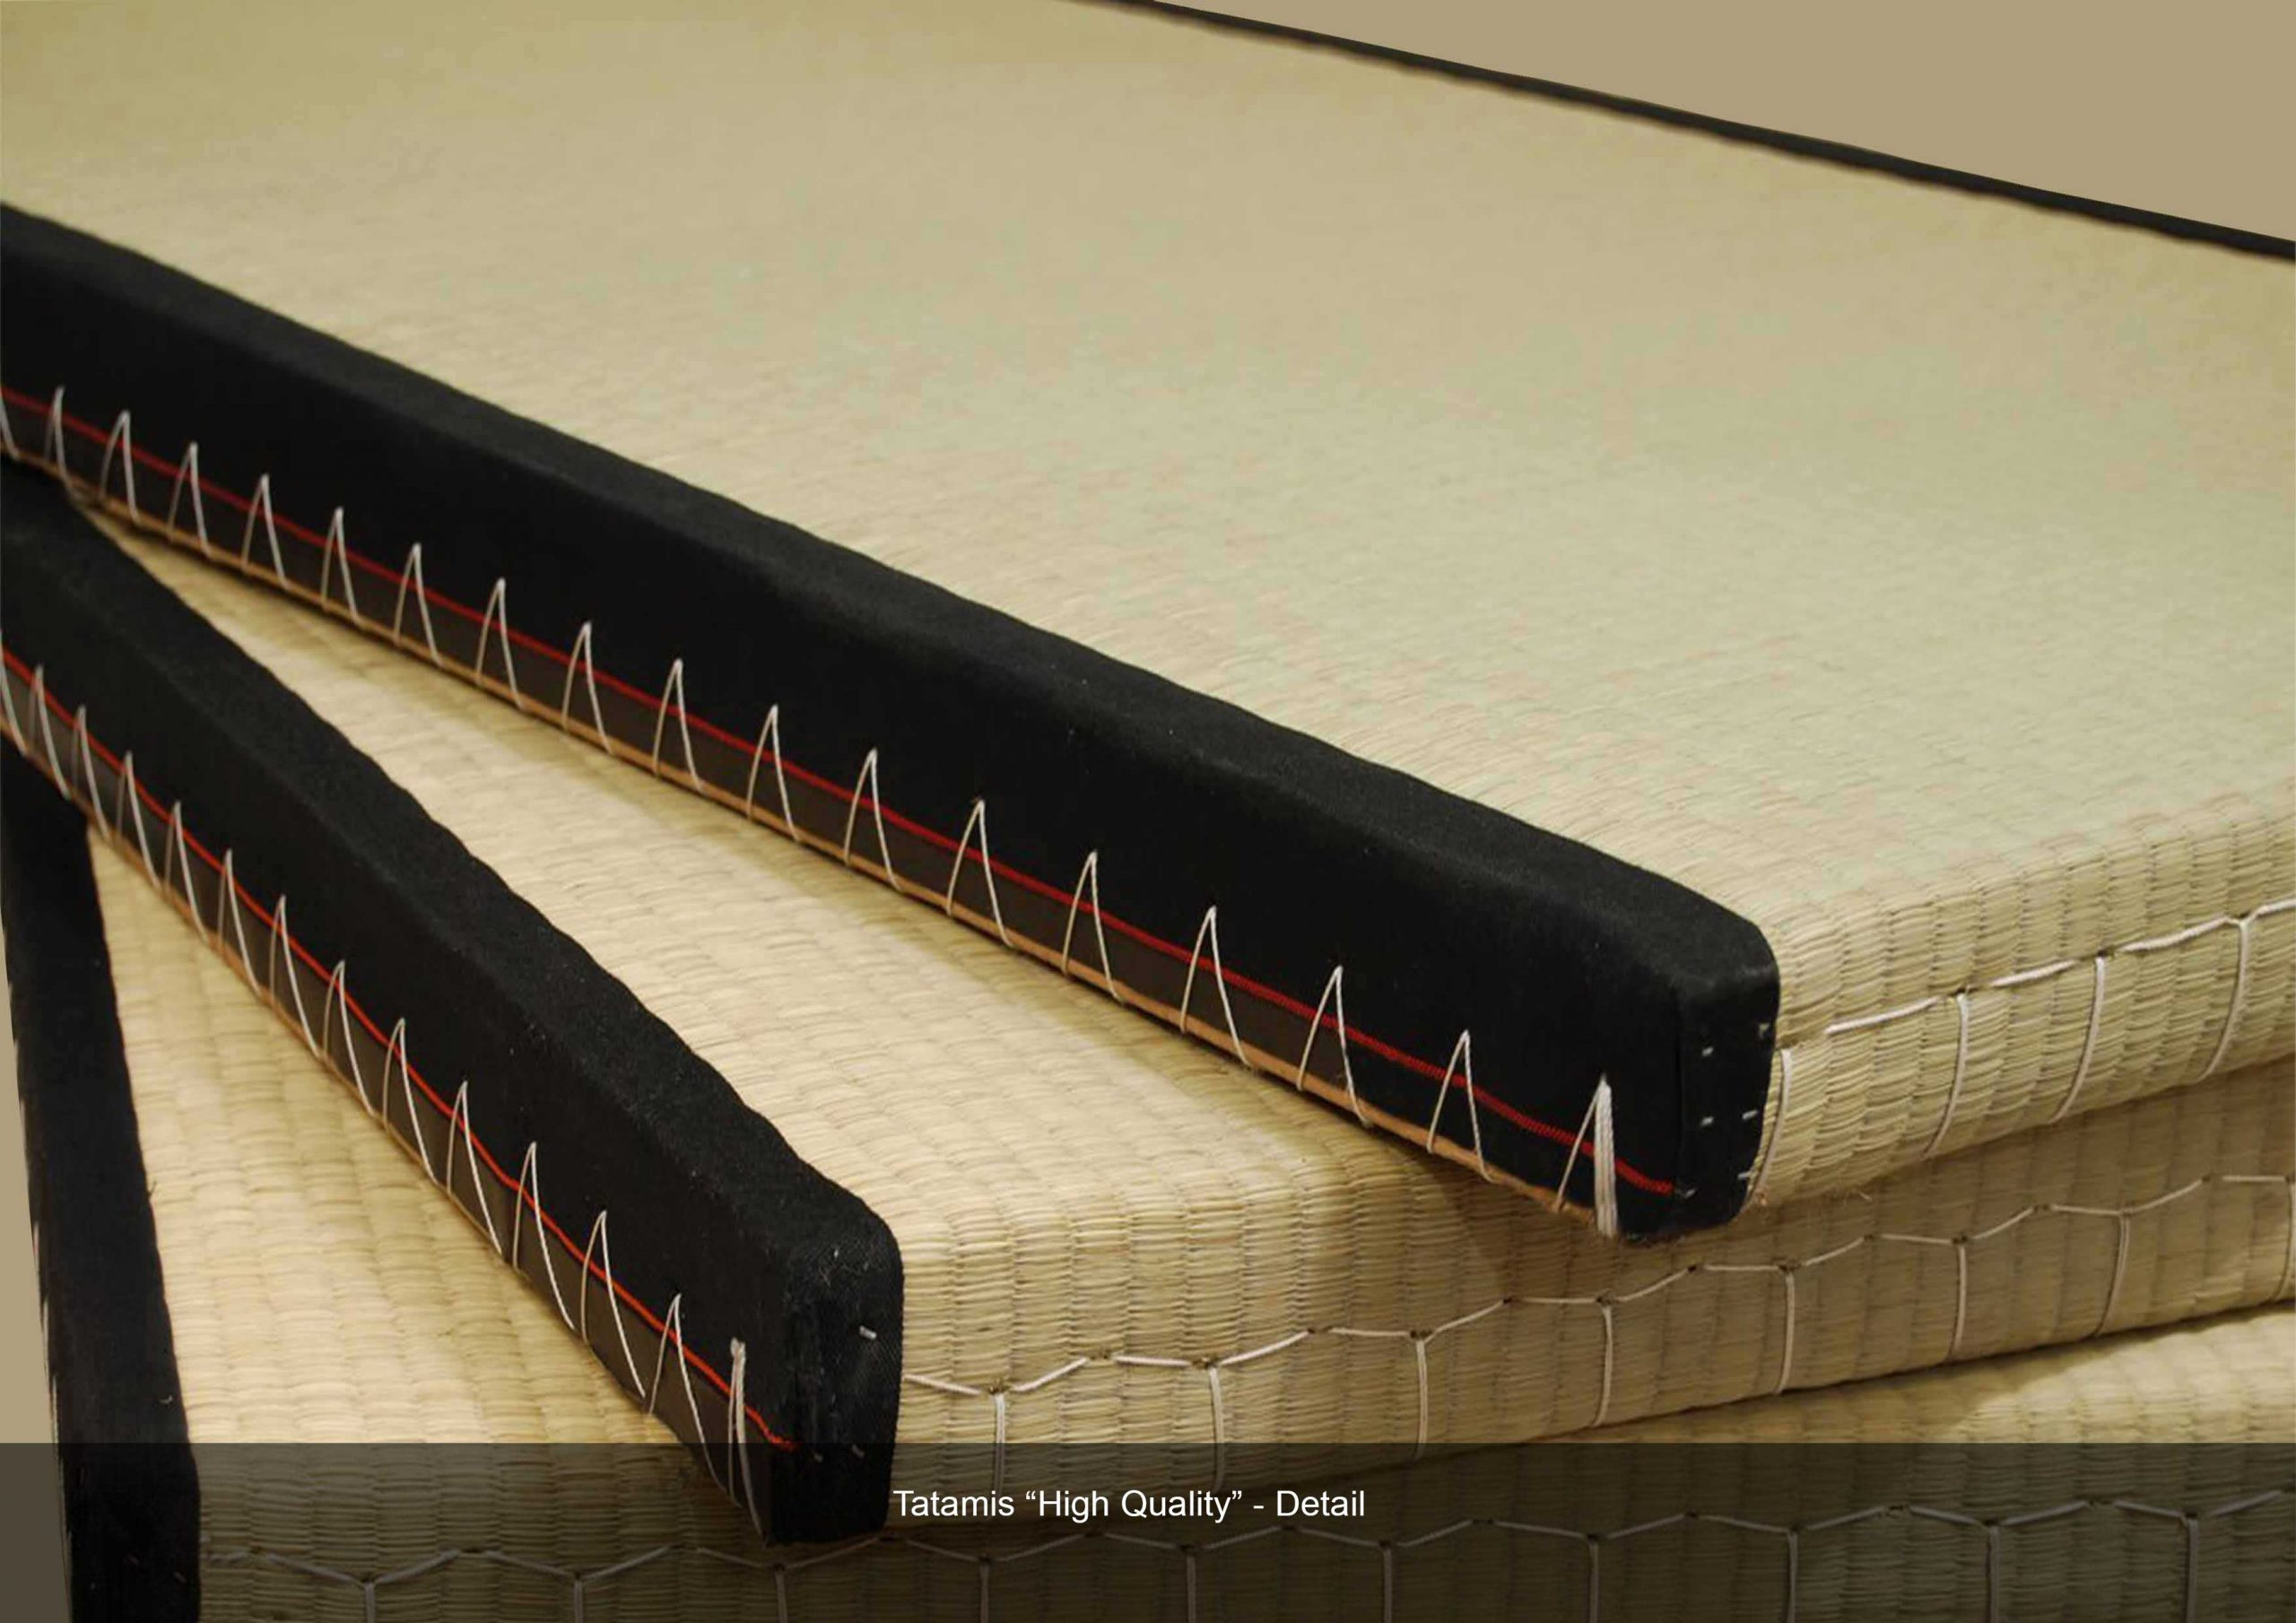 Tatami High Quality Detail